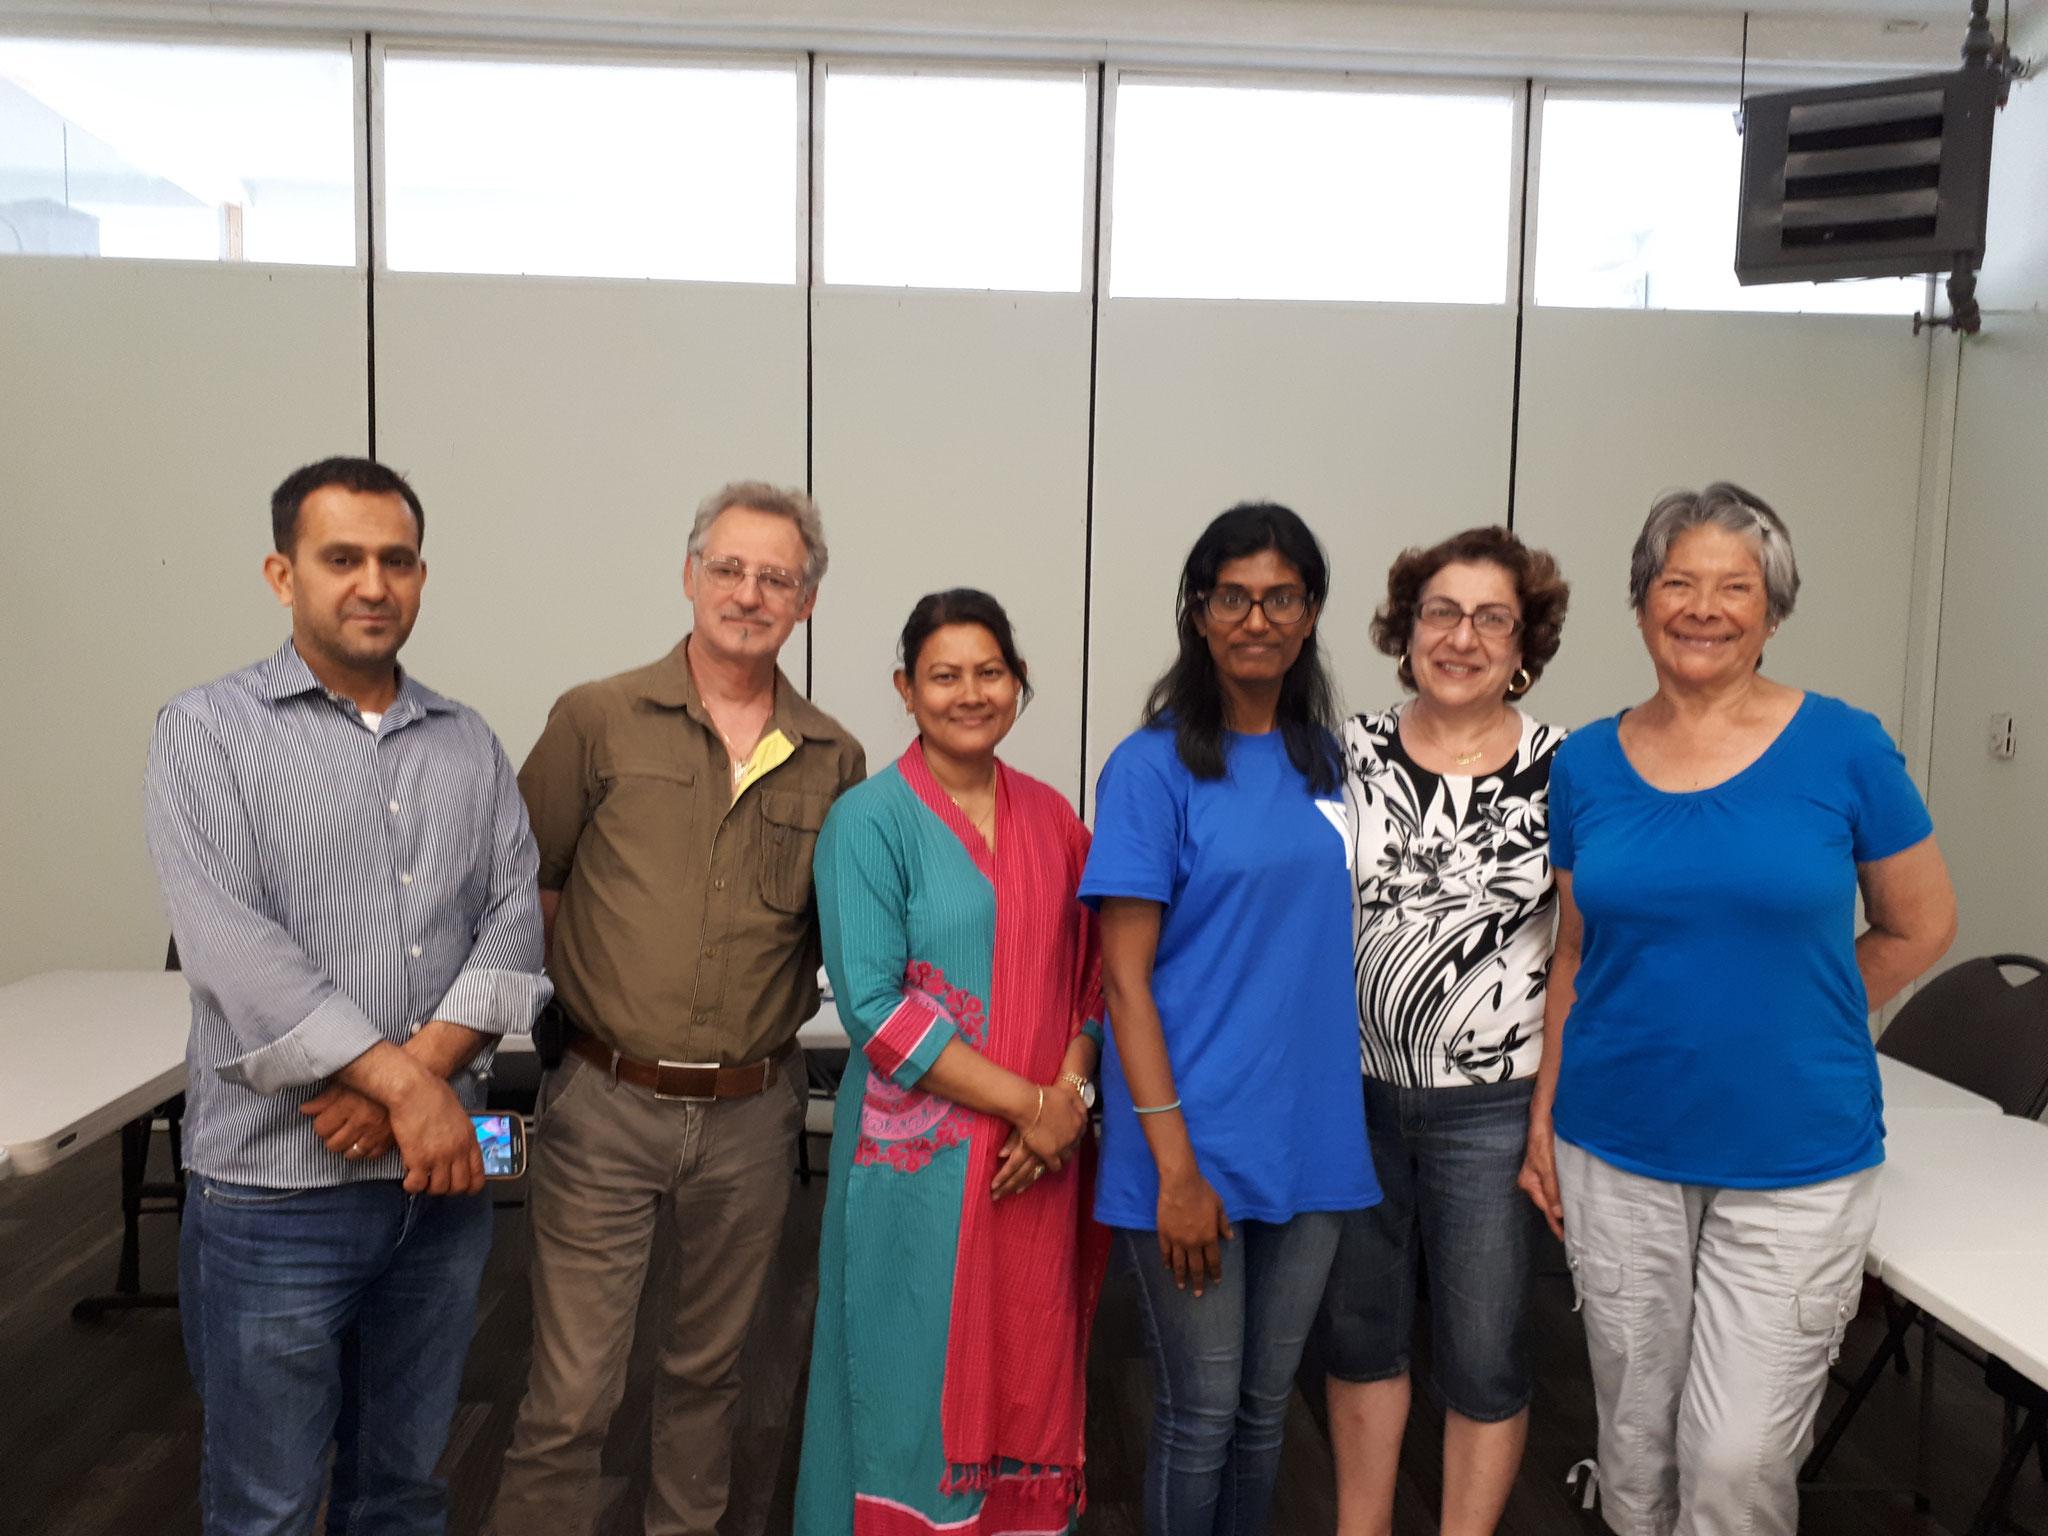 In a classroom at CACI - Centre d'appuis aux communautés immigrantes, Montreal, QC